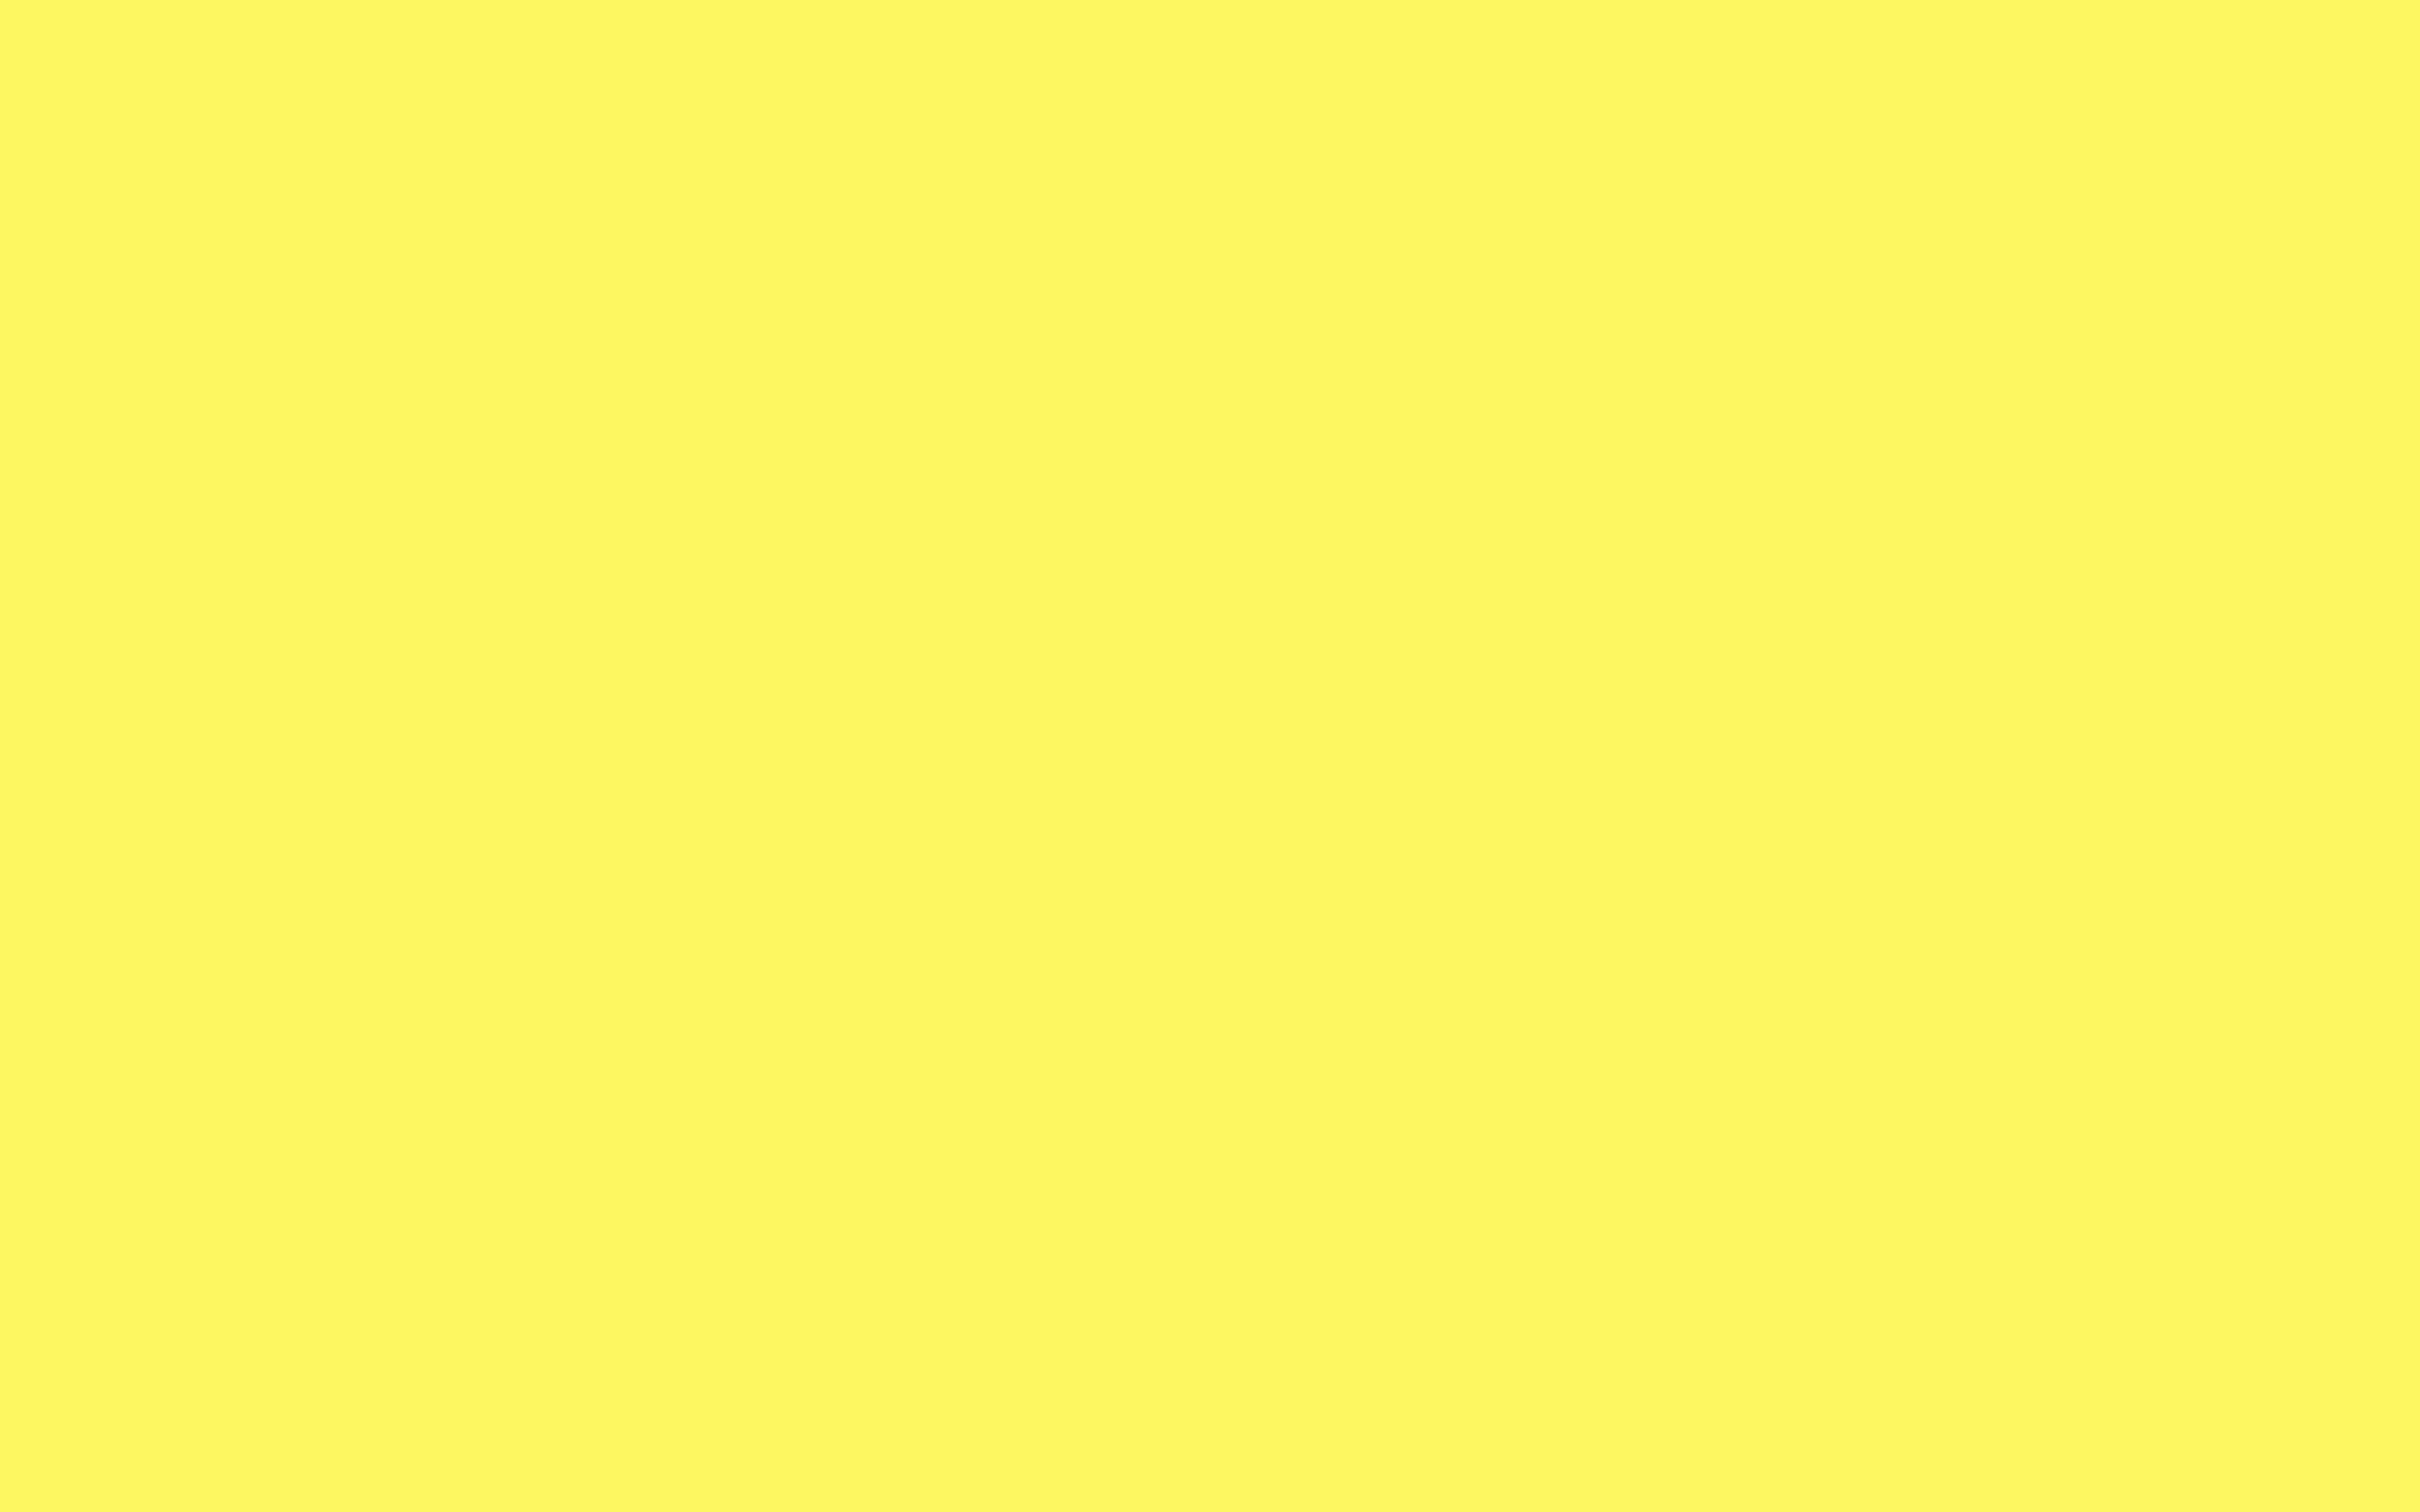 2560x1600 Icterine Solid Color Background